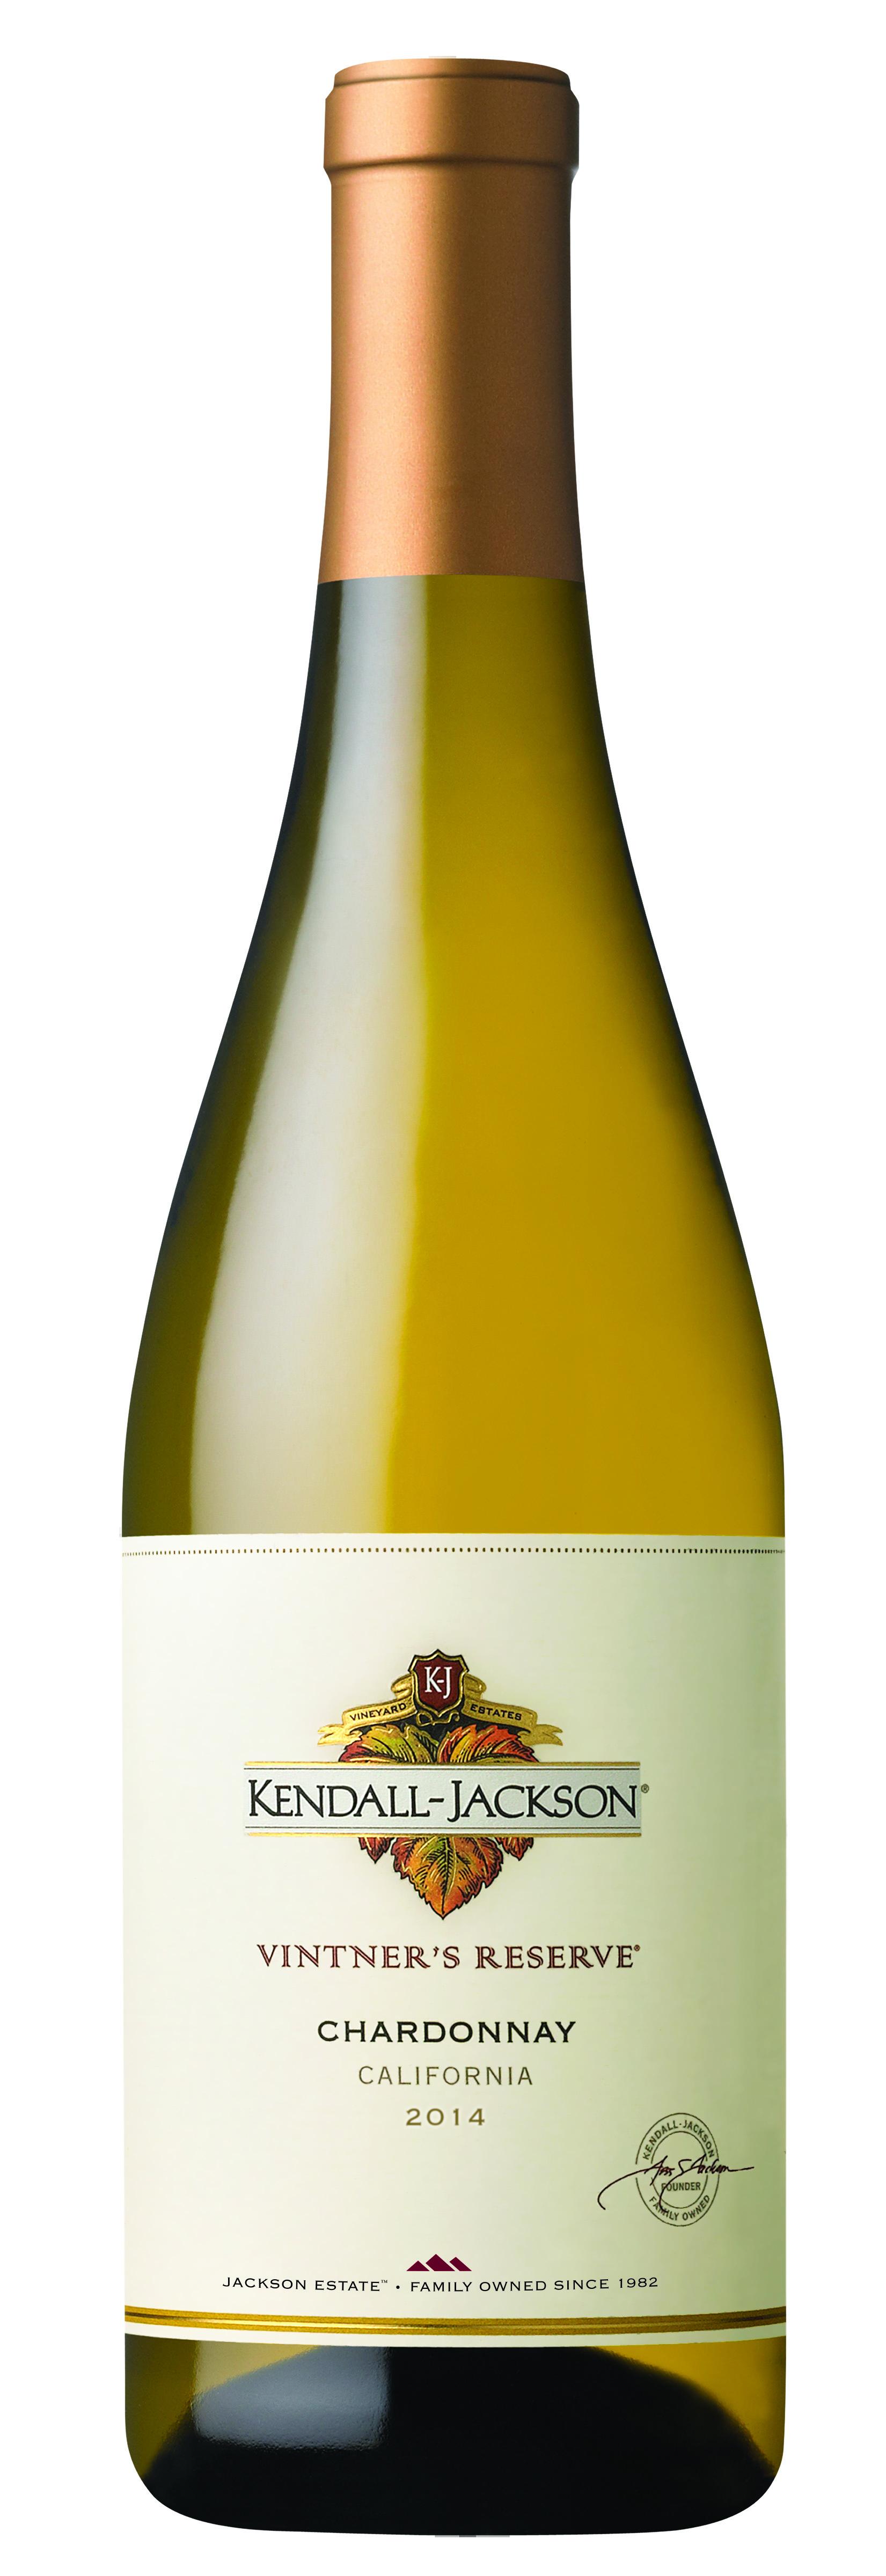 2014 Kendall-Jackson Vintner's Reserve Chardonnay California